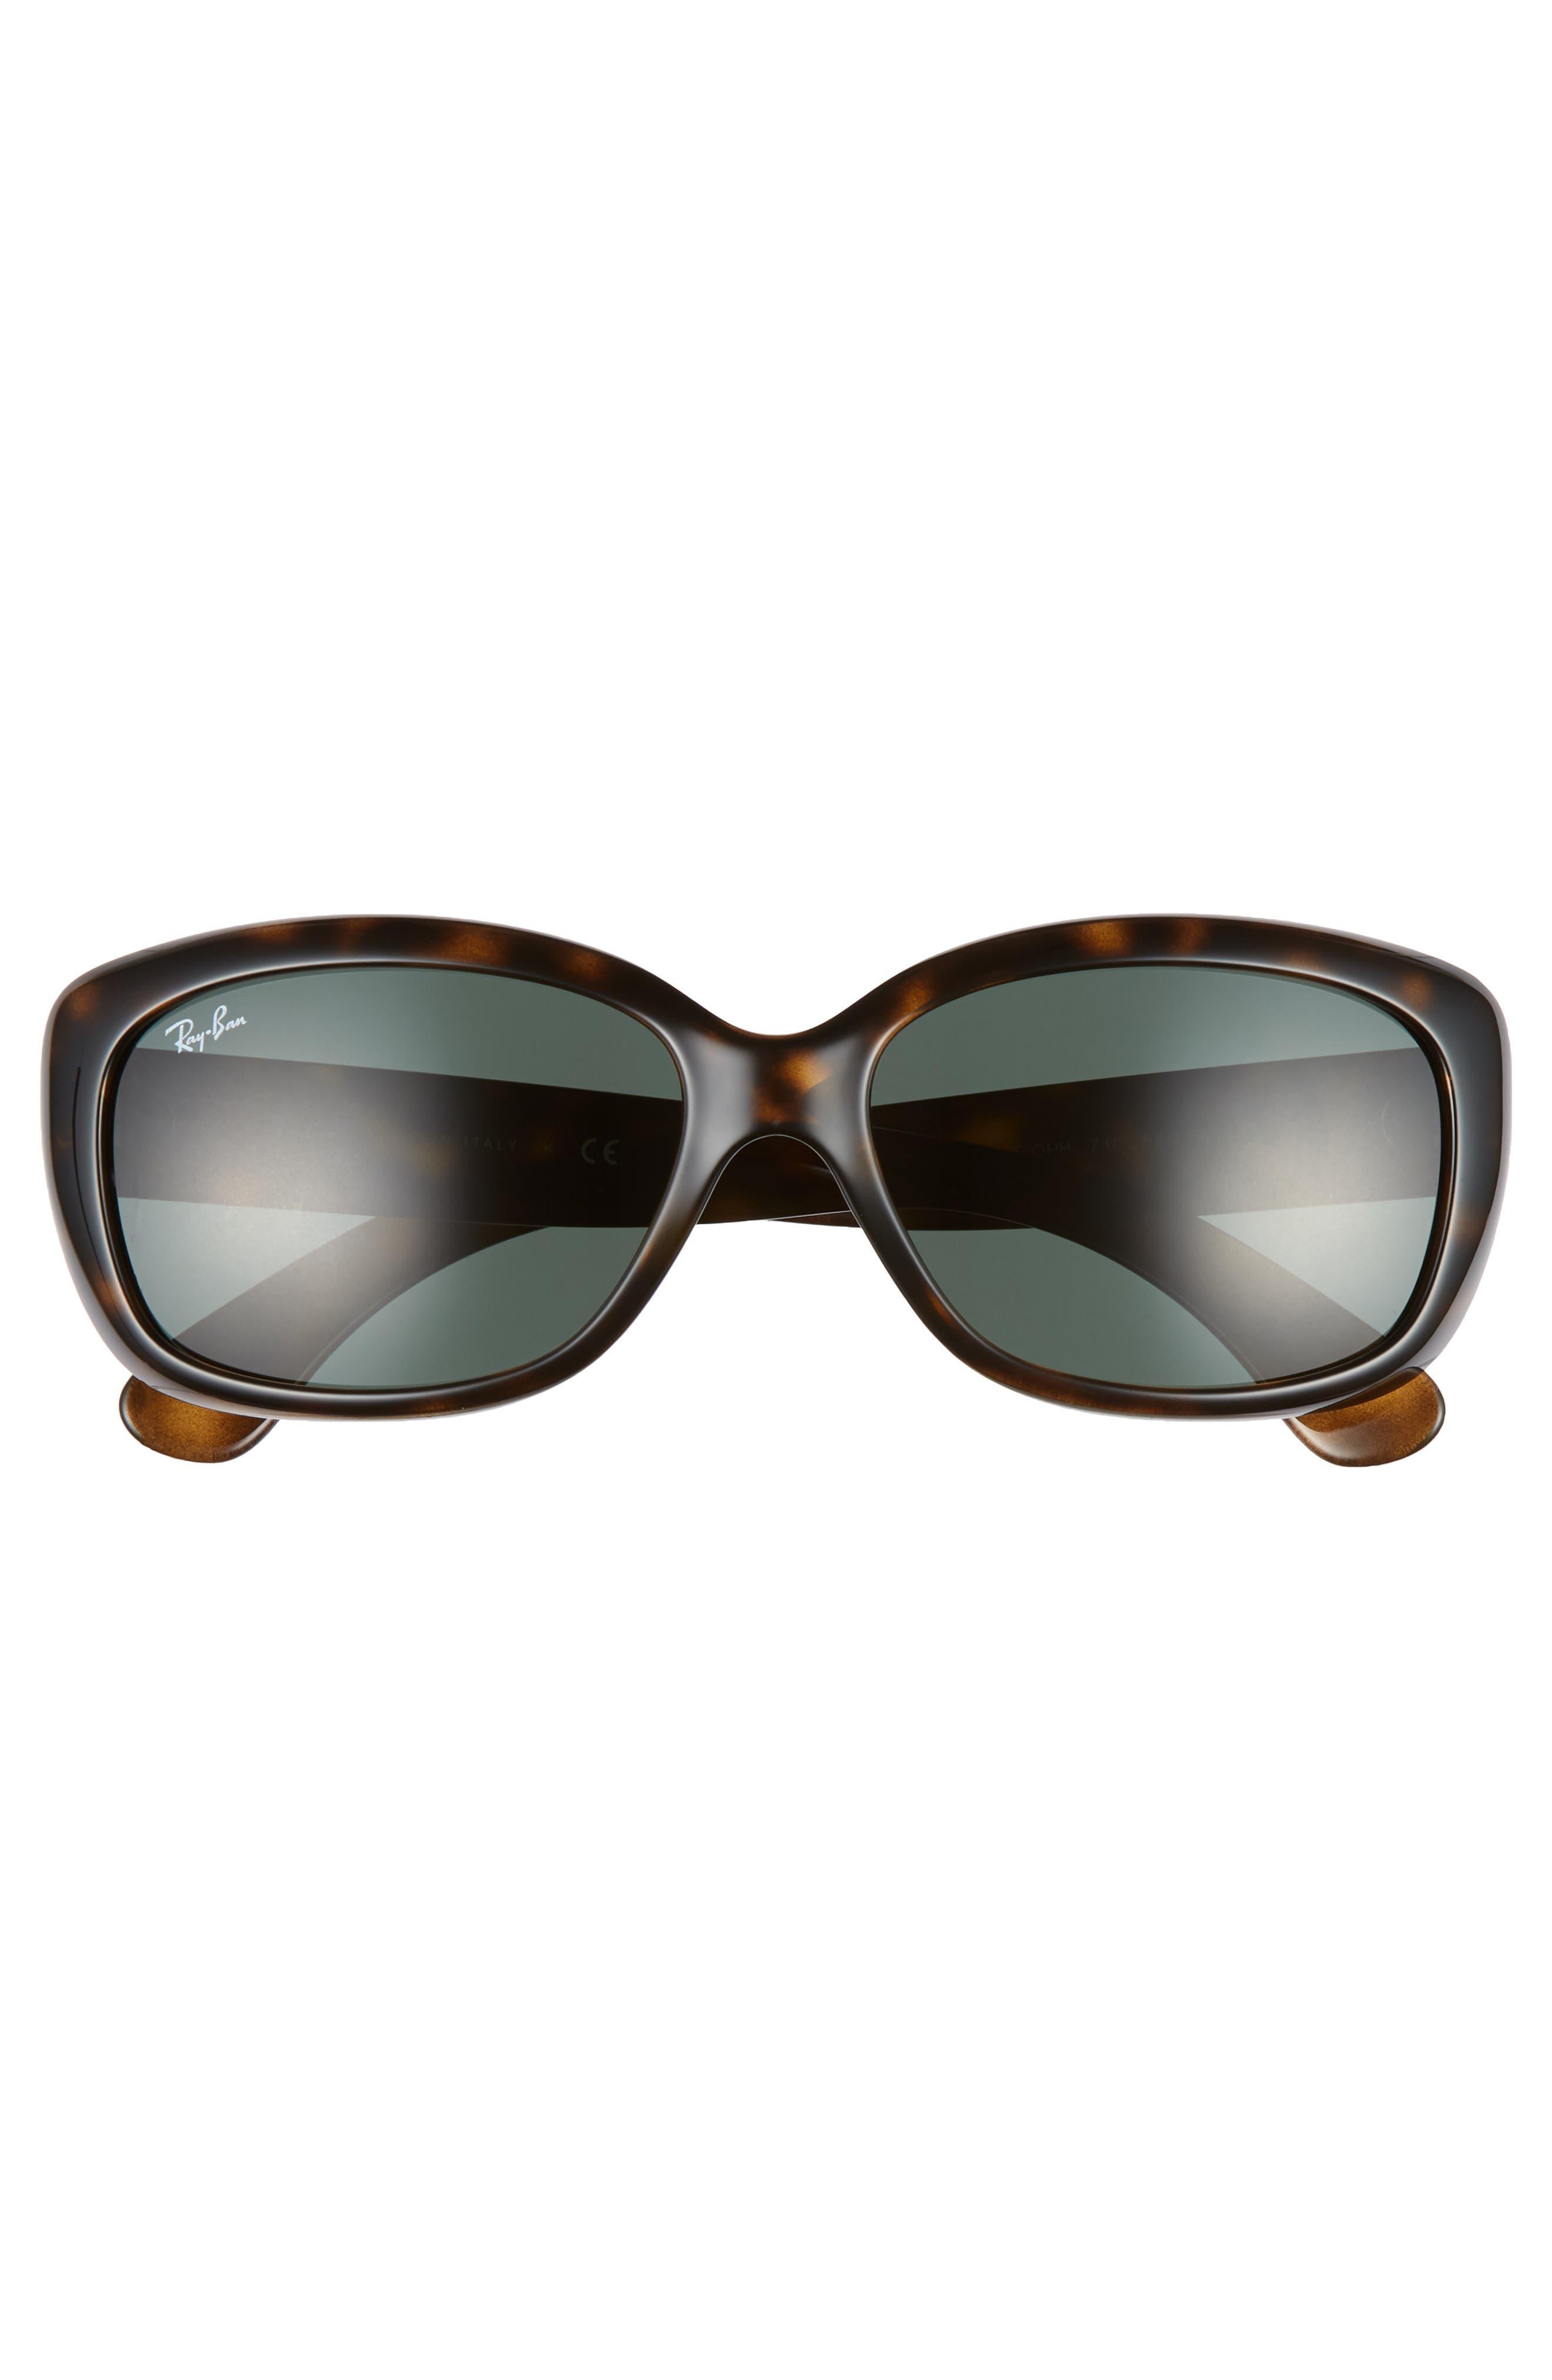 RAY-BAN, Jackie Ohh 58mm Cat Eye Sunglasses, Alternate thumbnail 3, color, LITE HAVANA/ GREEN SOLID